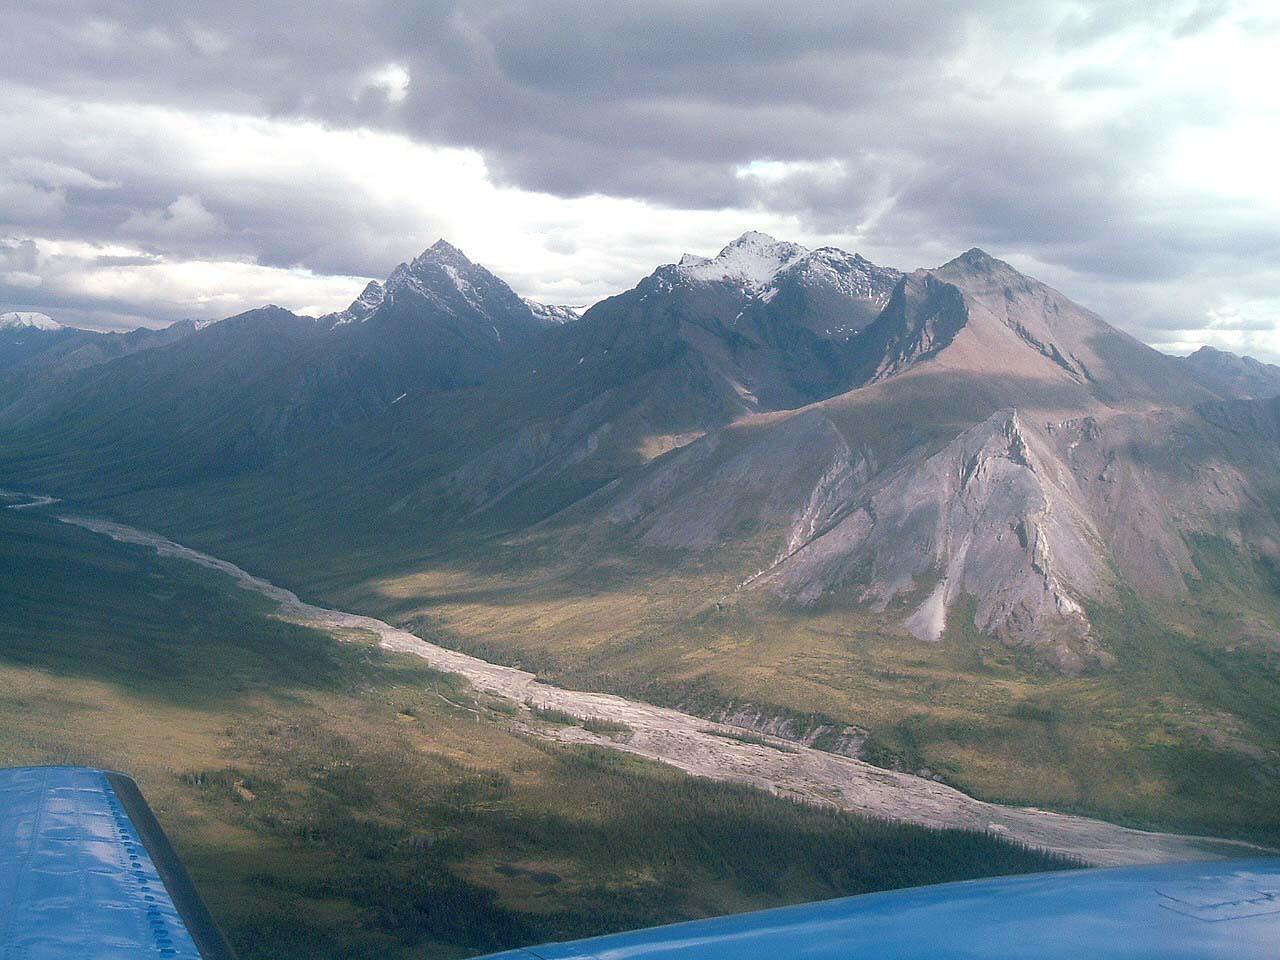 Northern Alaska Tour Company - Alaska tour